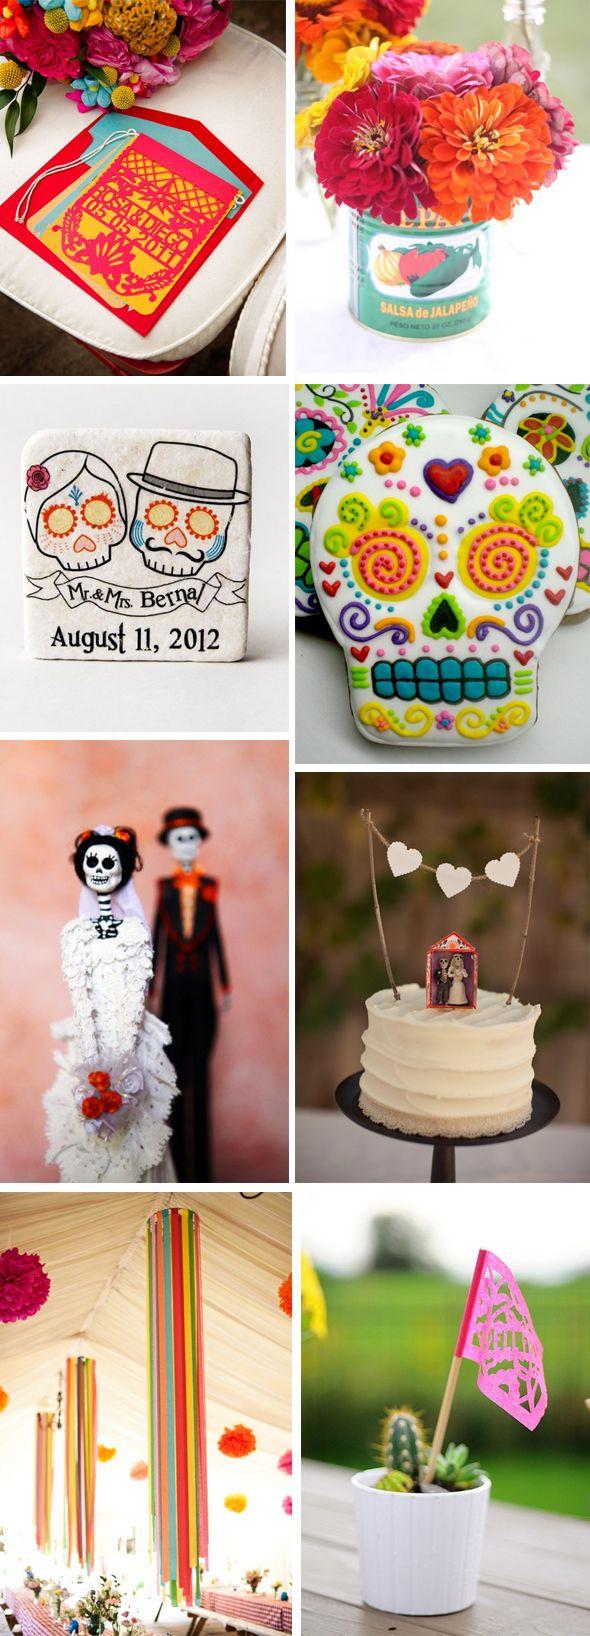 Mexico Destination Wedding   The Destination Wedding Blog - Jet Fete by Bridal Bar